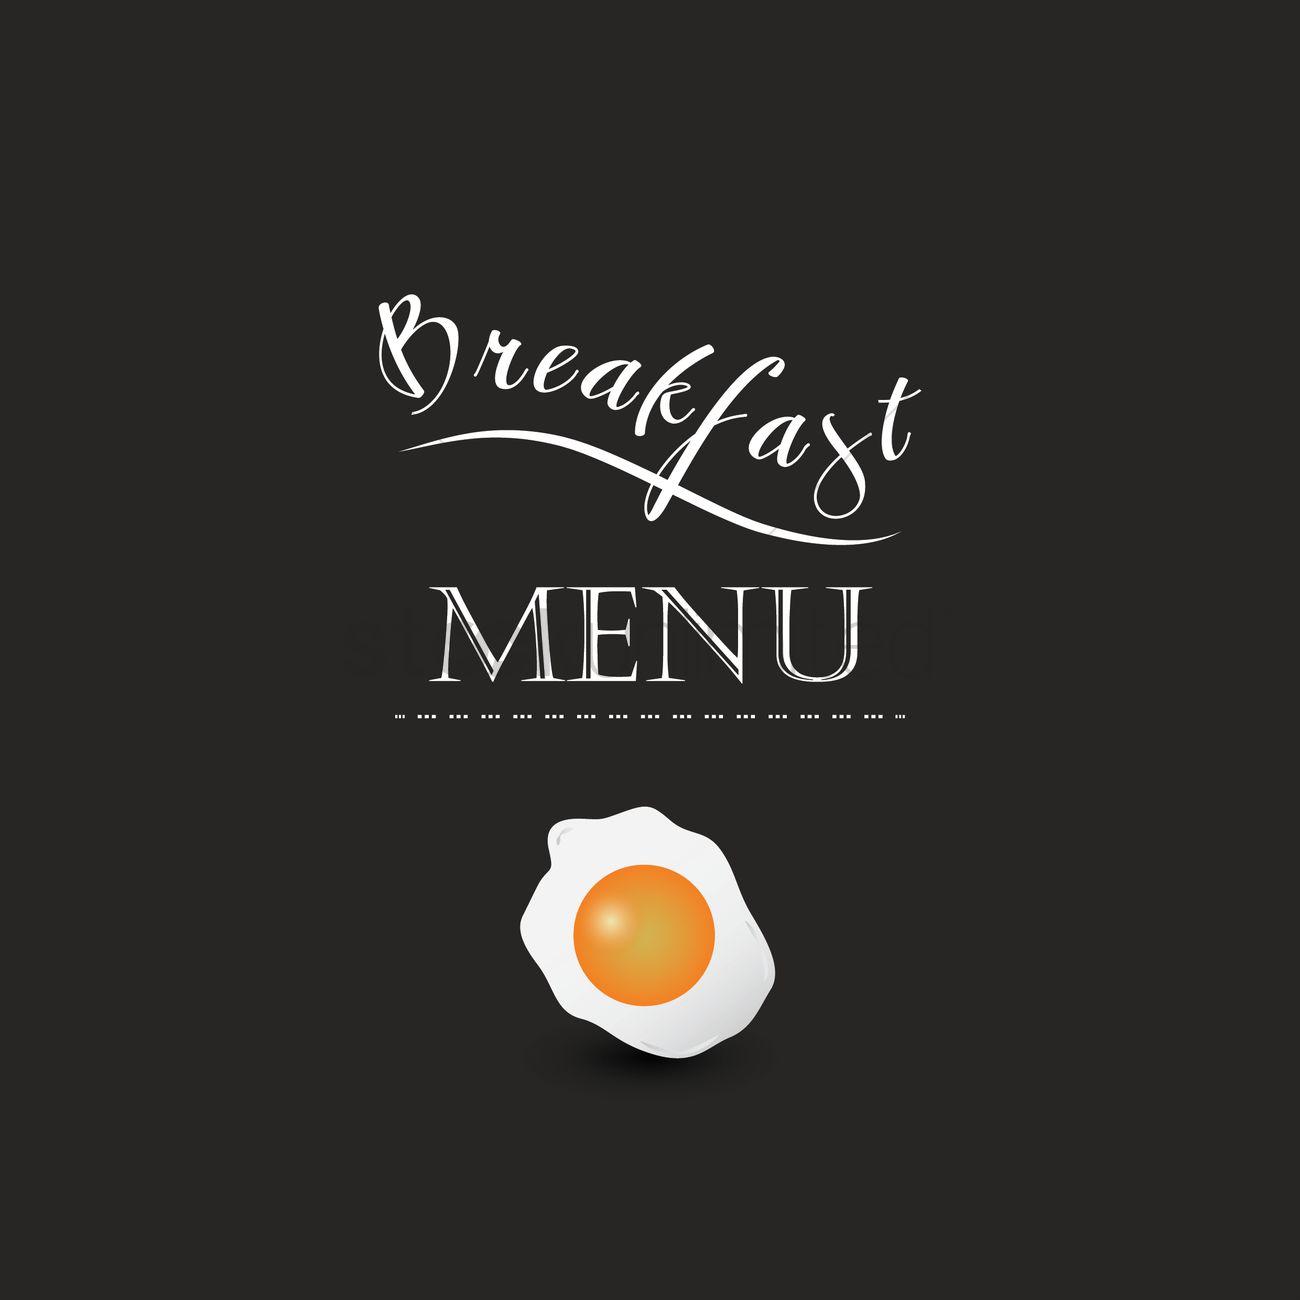 breakfast menu design vector image - 1710736 | stockunlimited